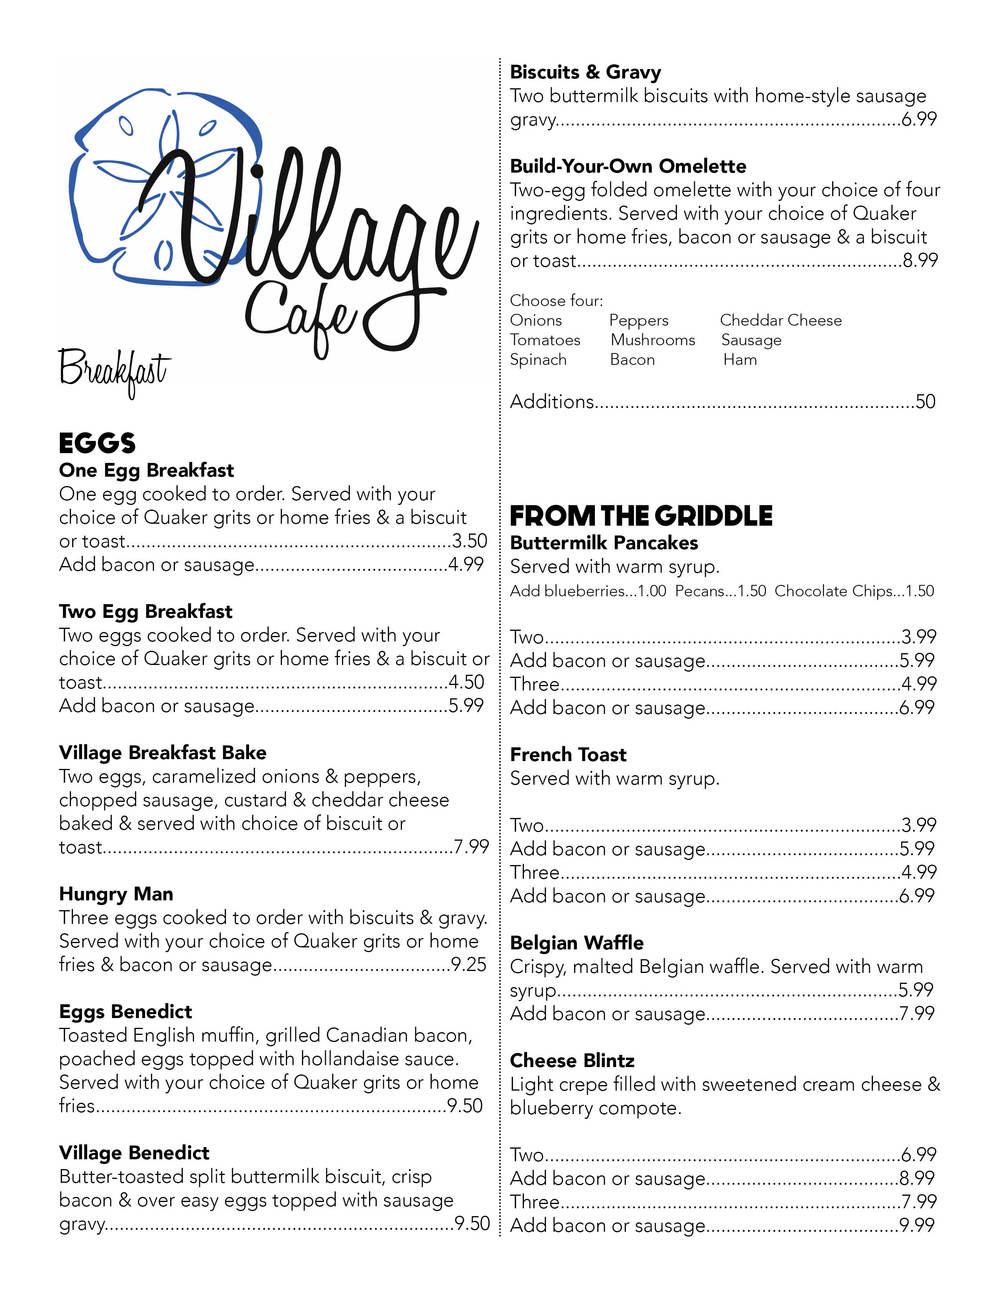 Village Cafe Breakfast Menu 10.22.15.jpg